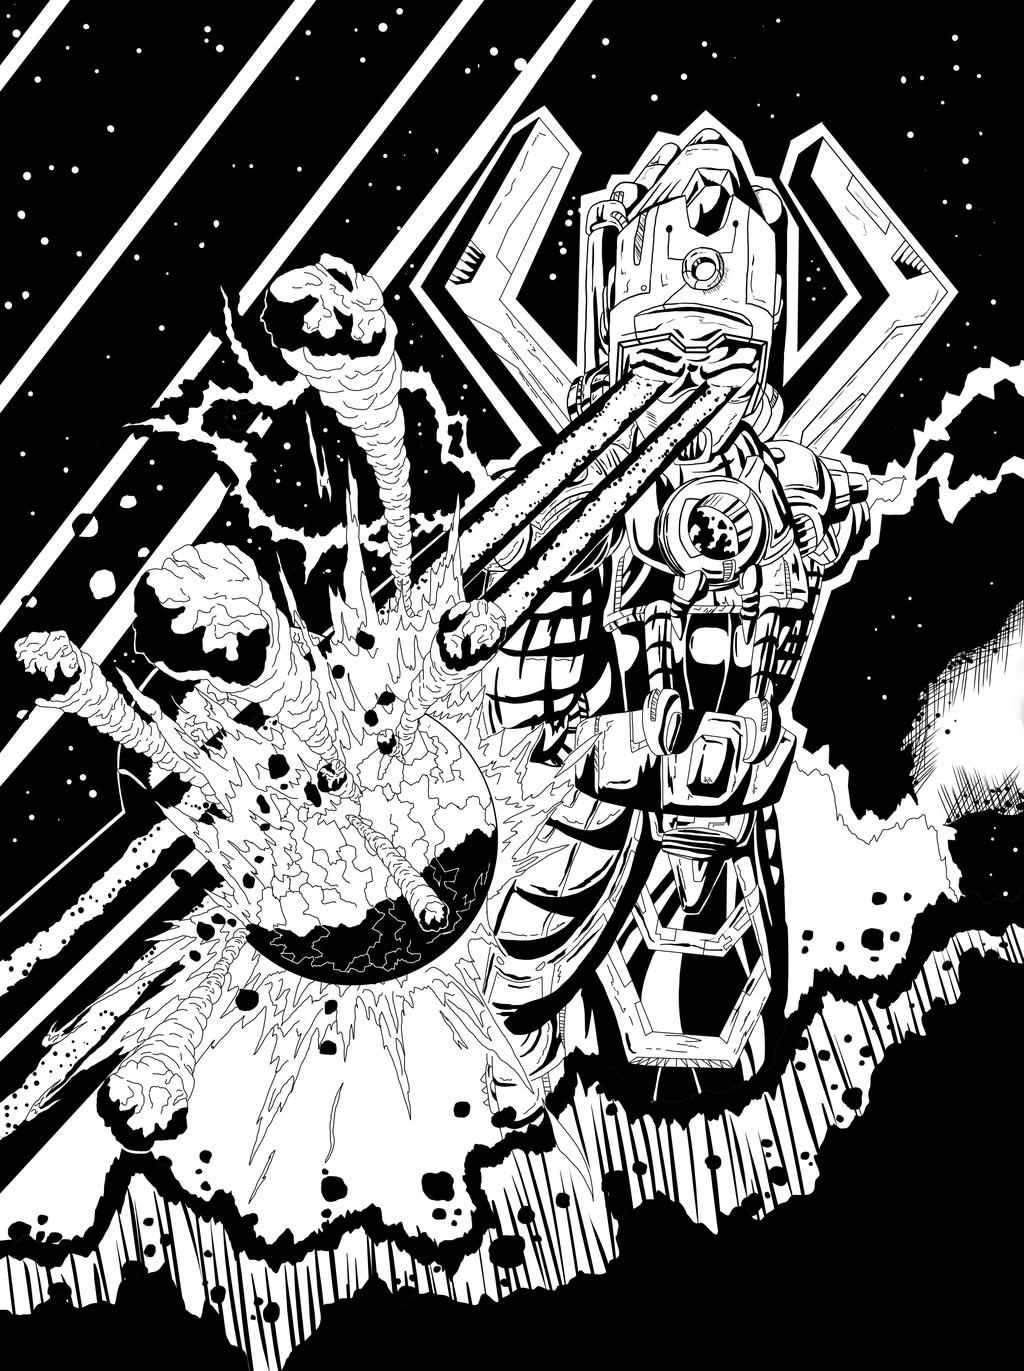 Most recent image: Galactus